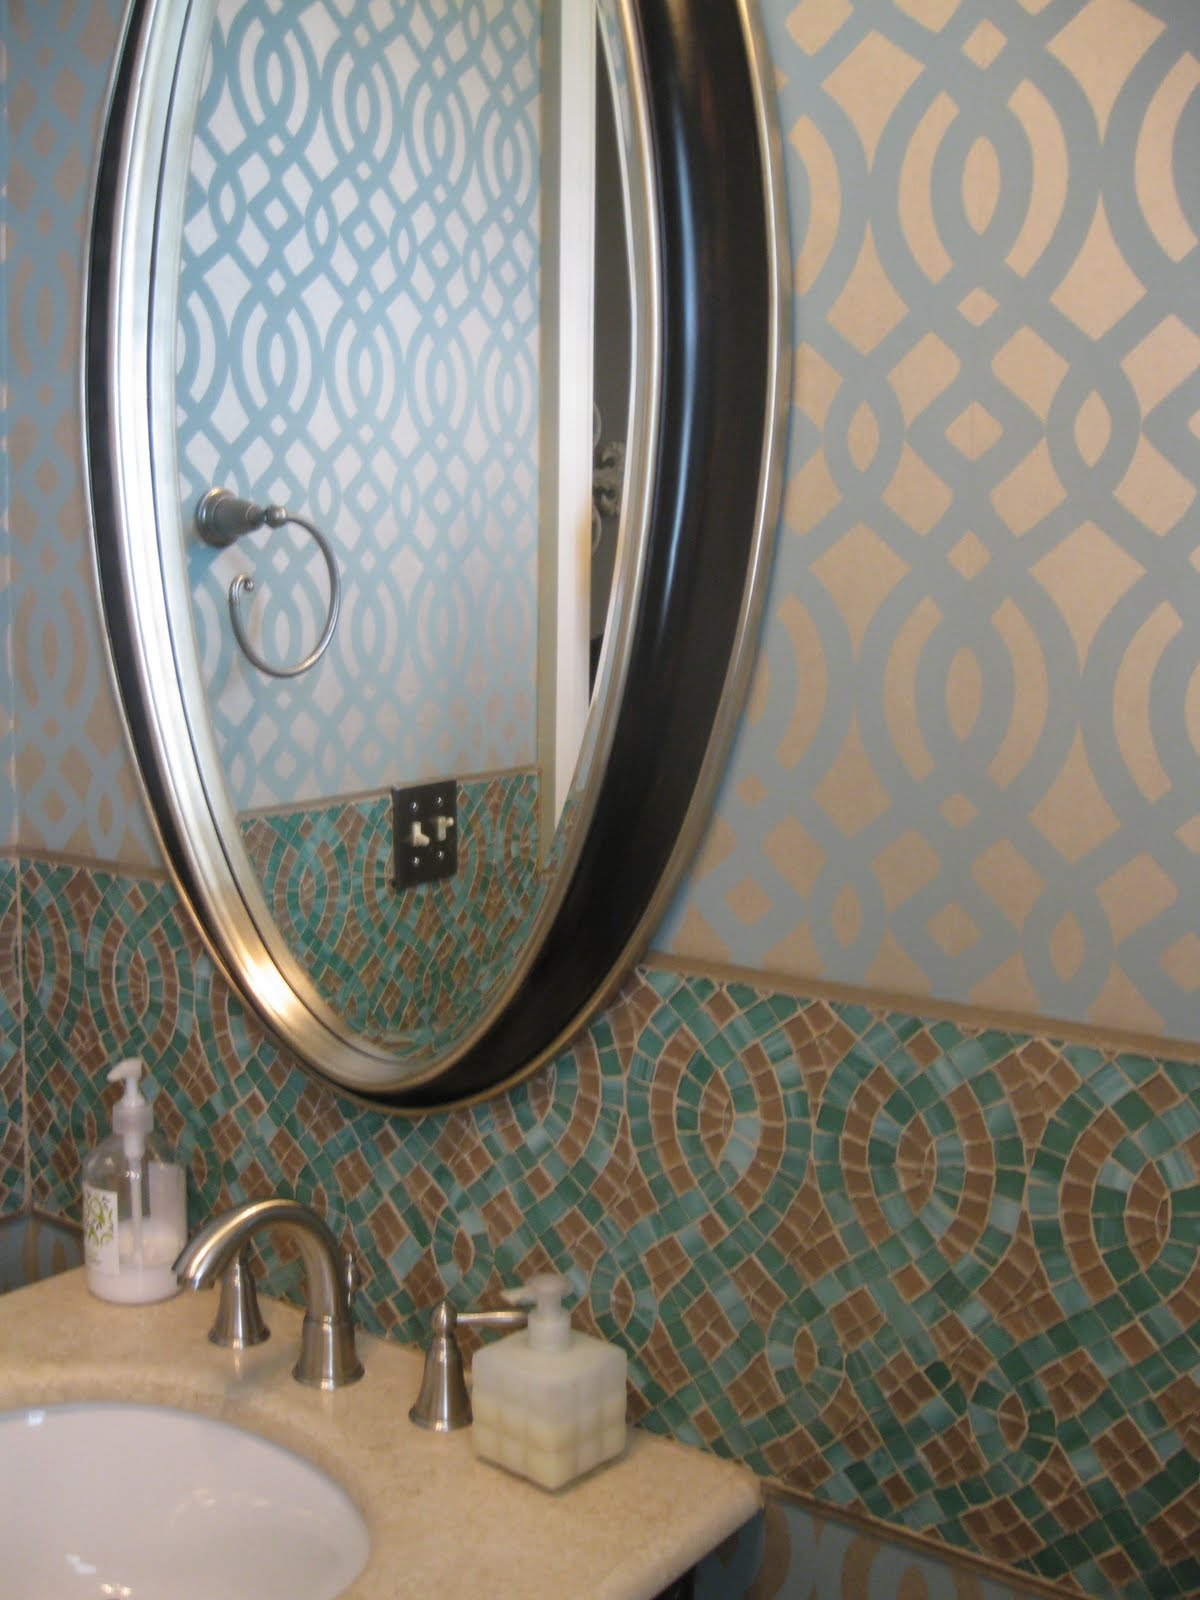 Angela Pence Interior Design: Before & After Powder Room with Custom  Backsplash